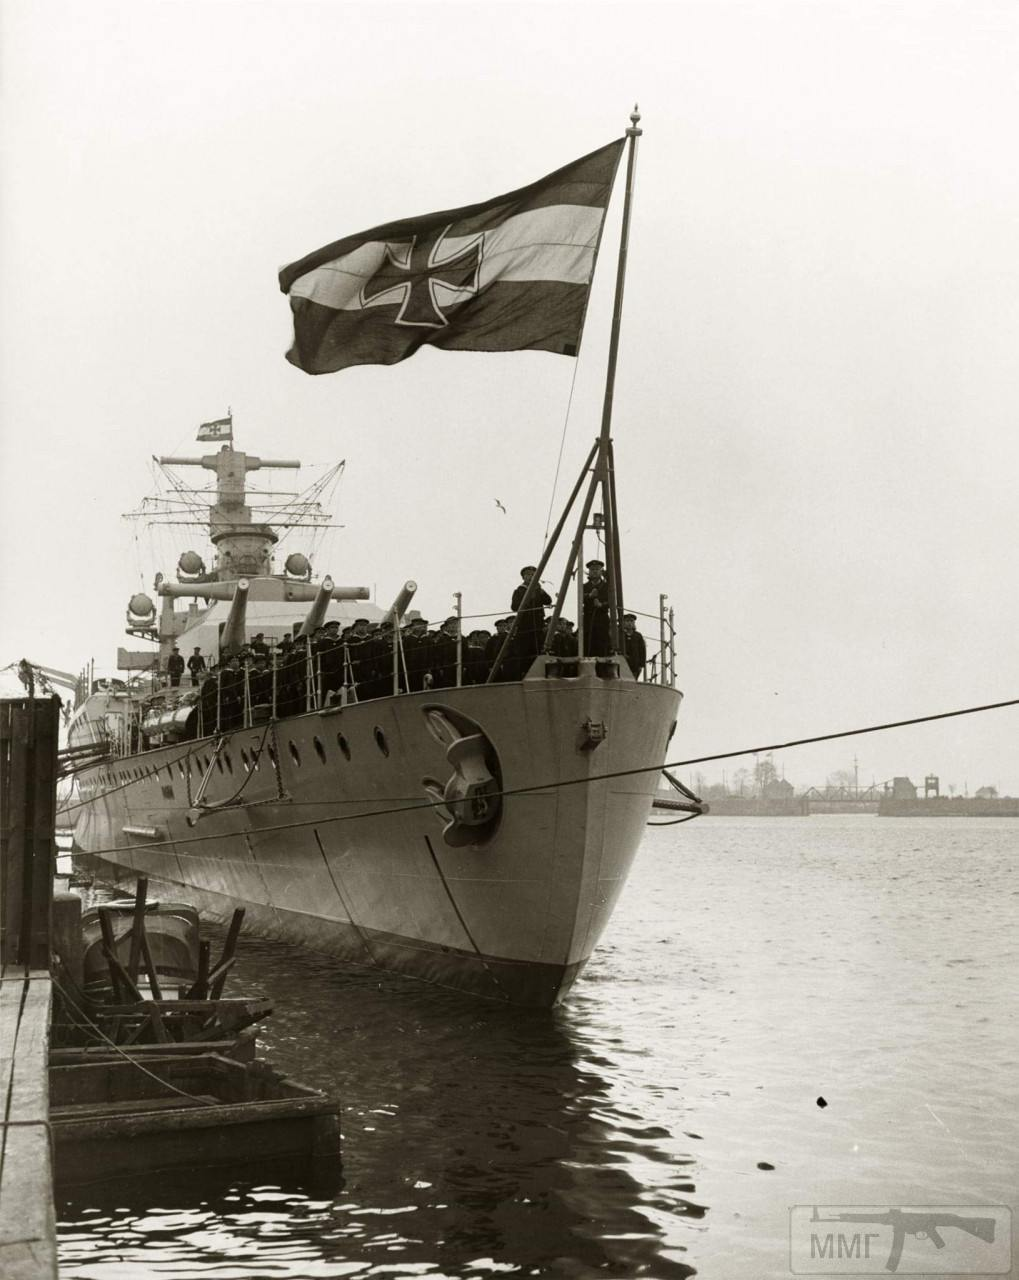 59721 - Тяжелый крейсер Deutschland